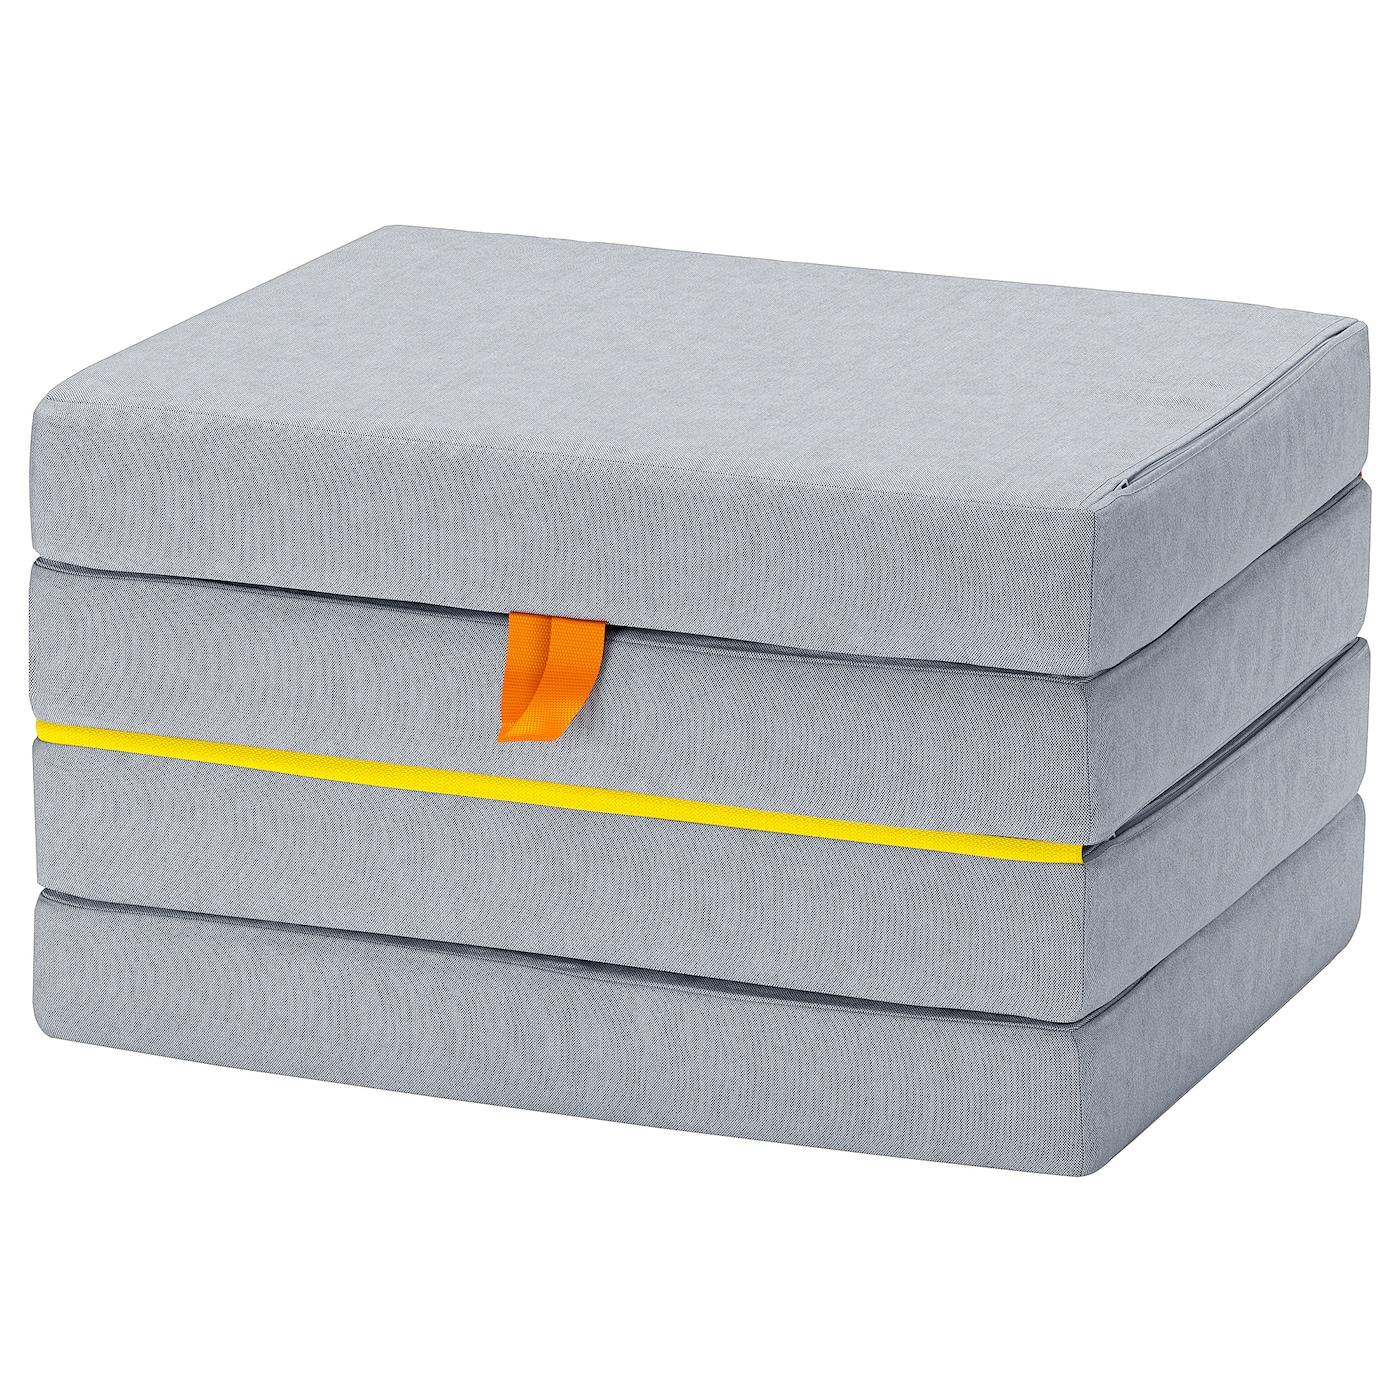 sl kt pouf matelas pliable ikea. Black Bedroom Furniture Sets. Home Design Ideas